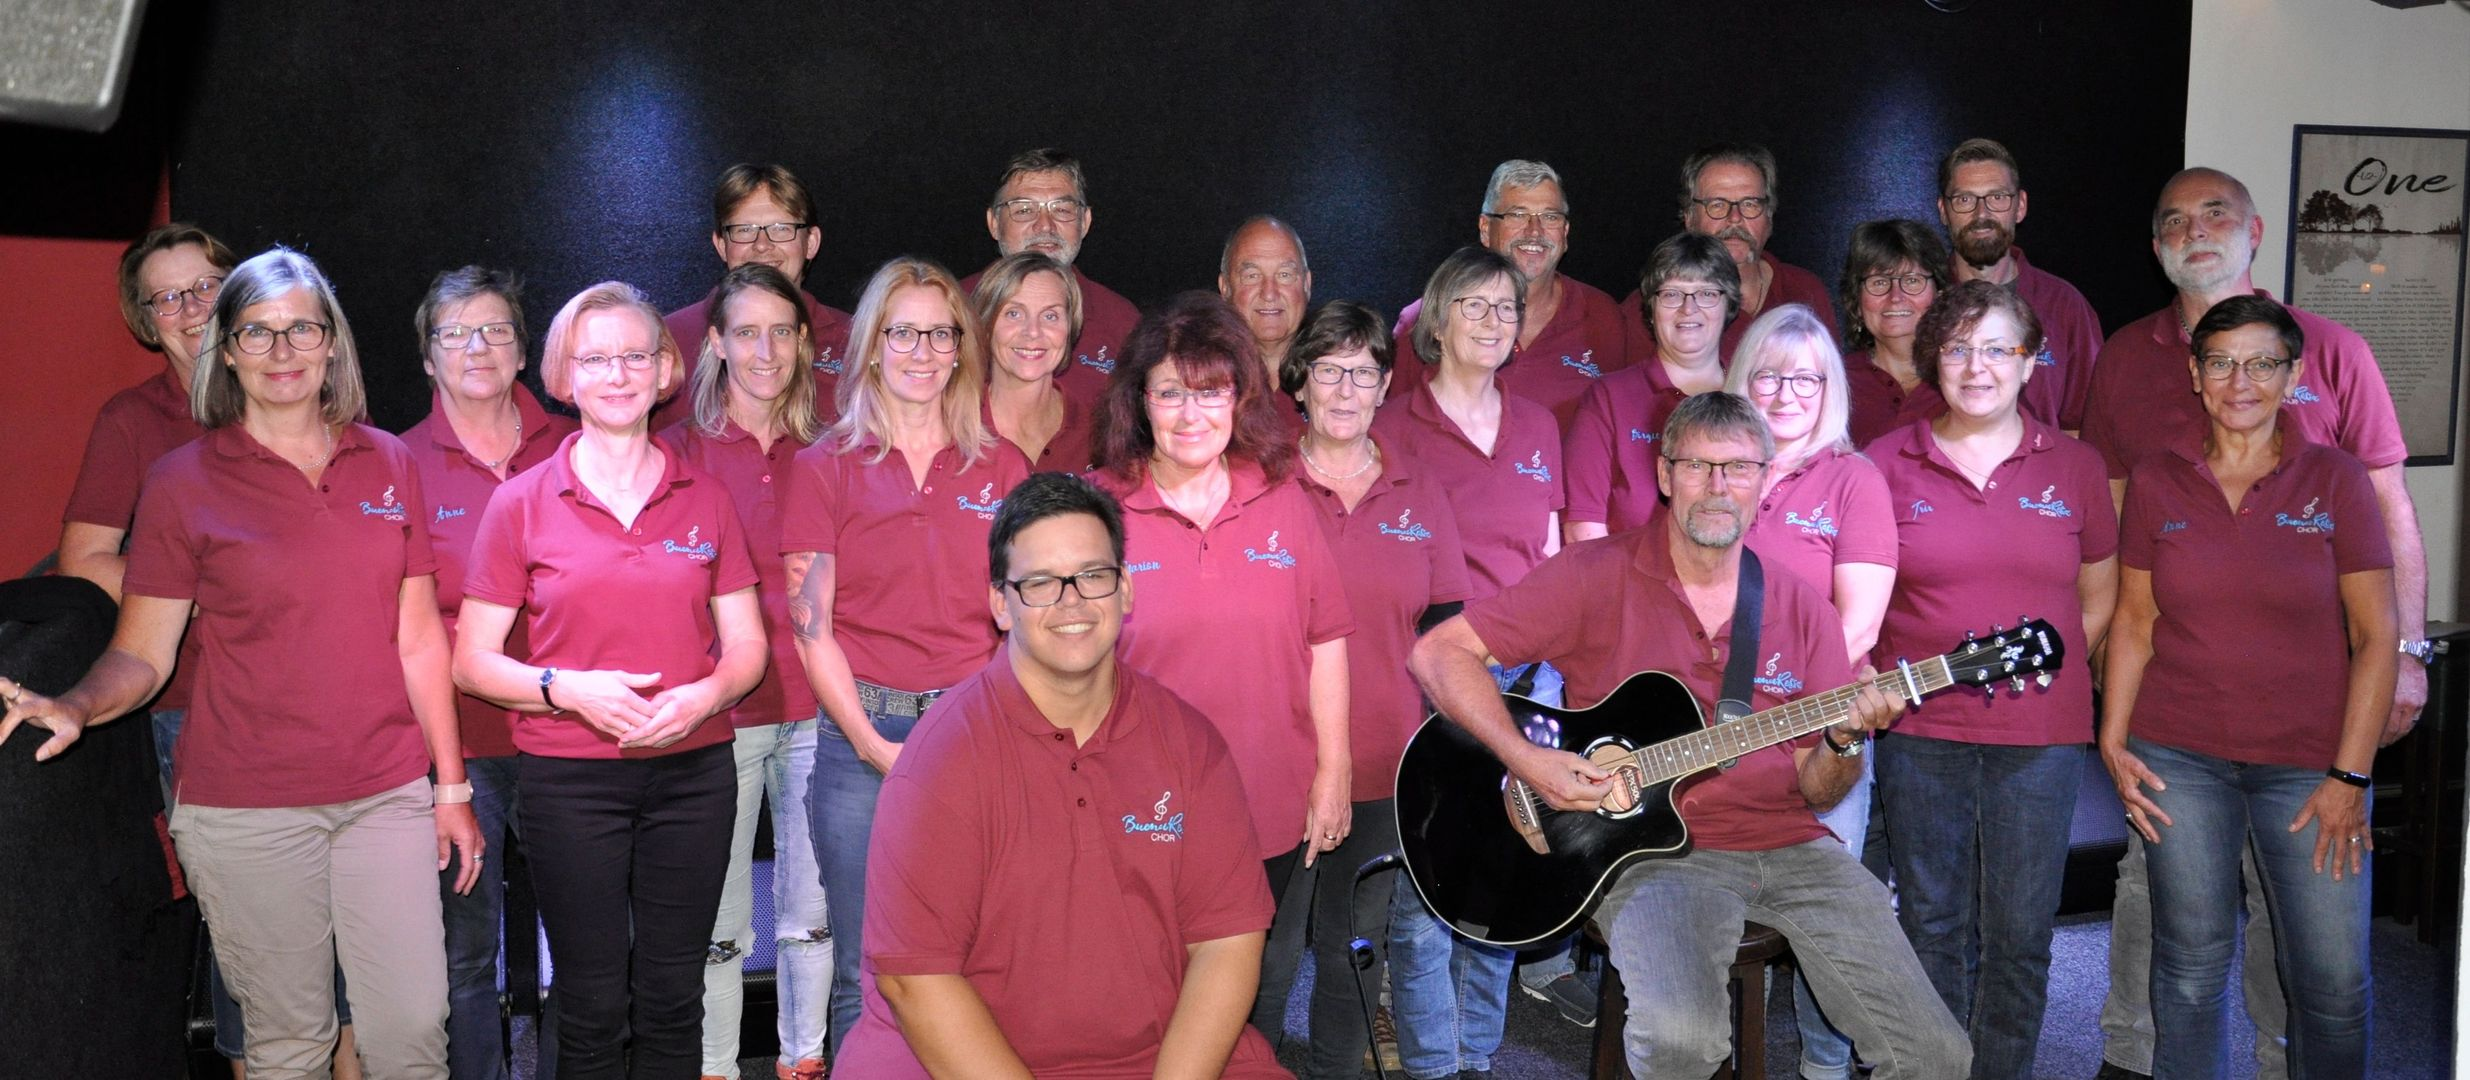 Concert Recordings | Buena Ressa Music Club